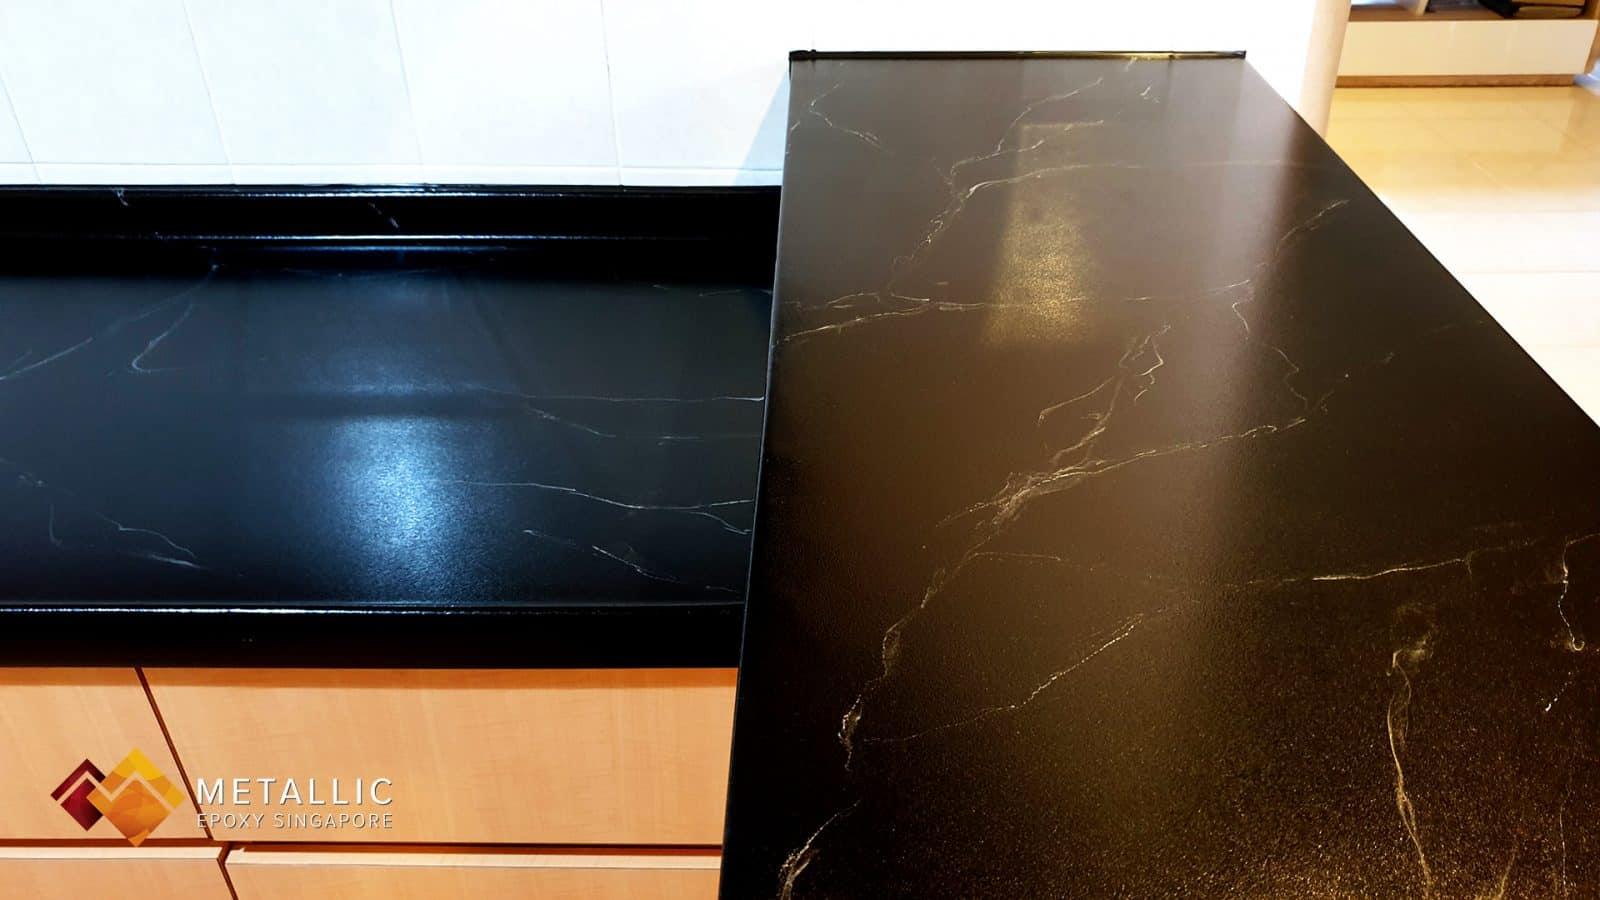 Silver Veins on Black countertop